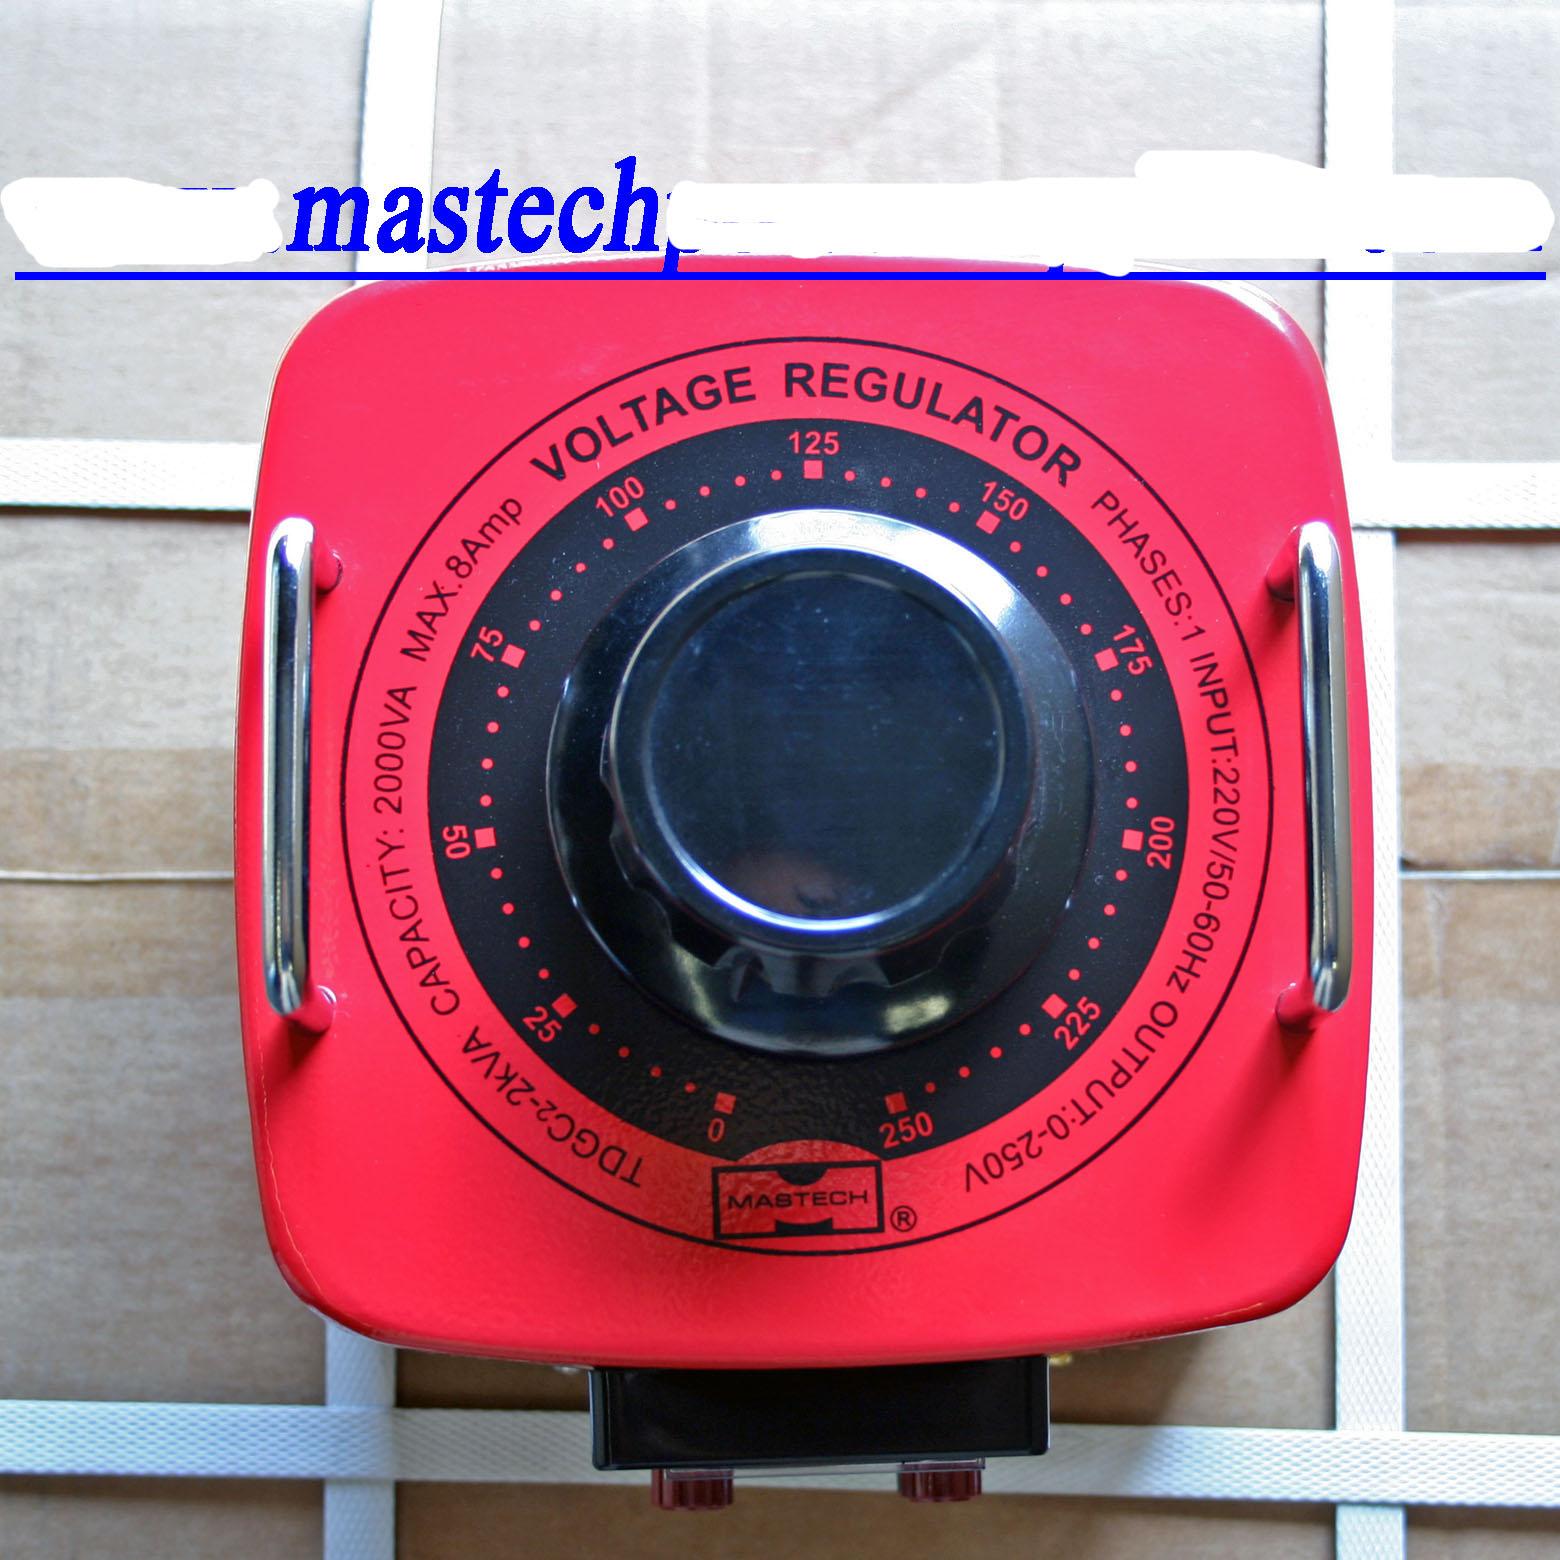 Mastech 2KW Variac